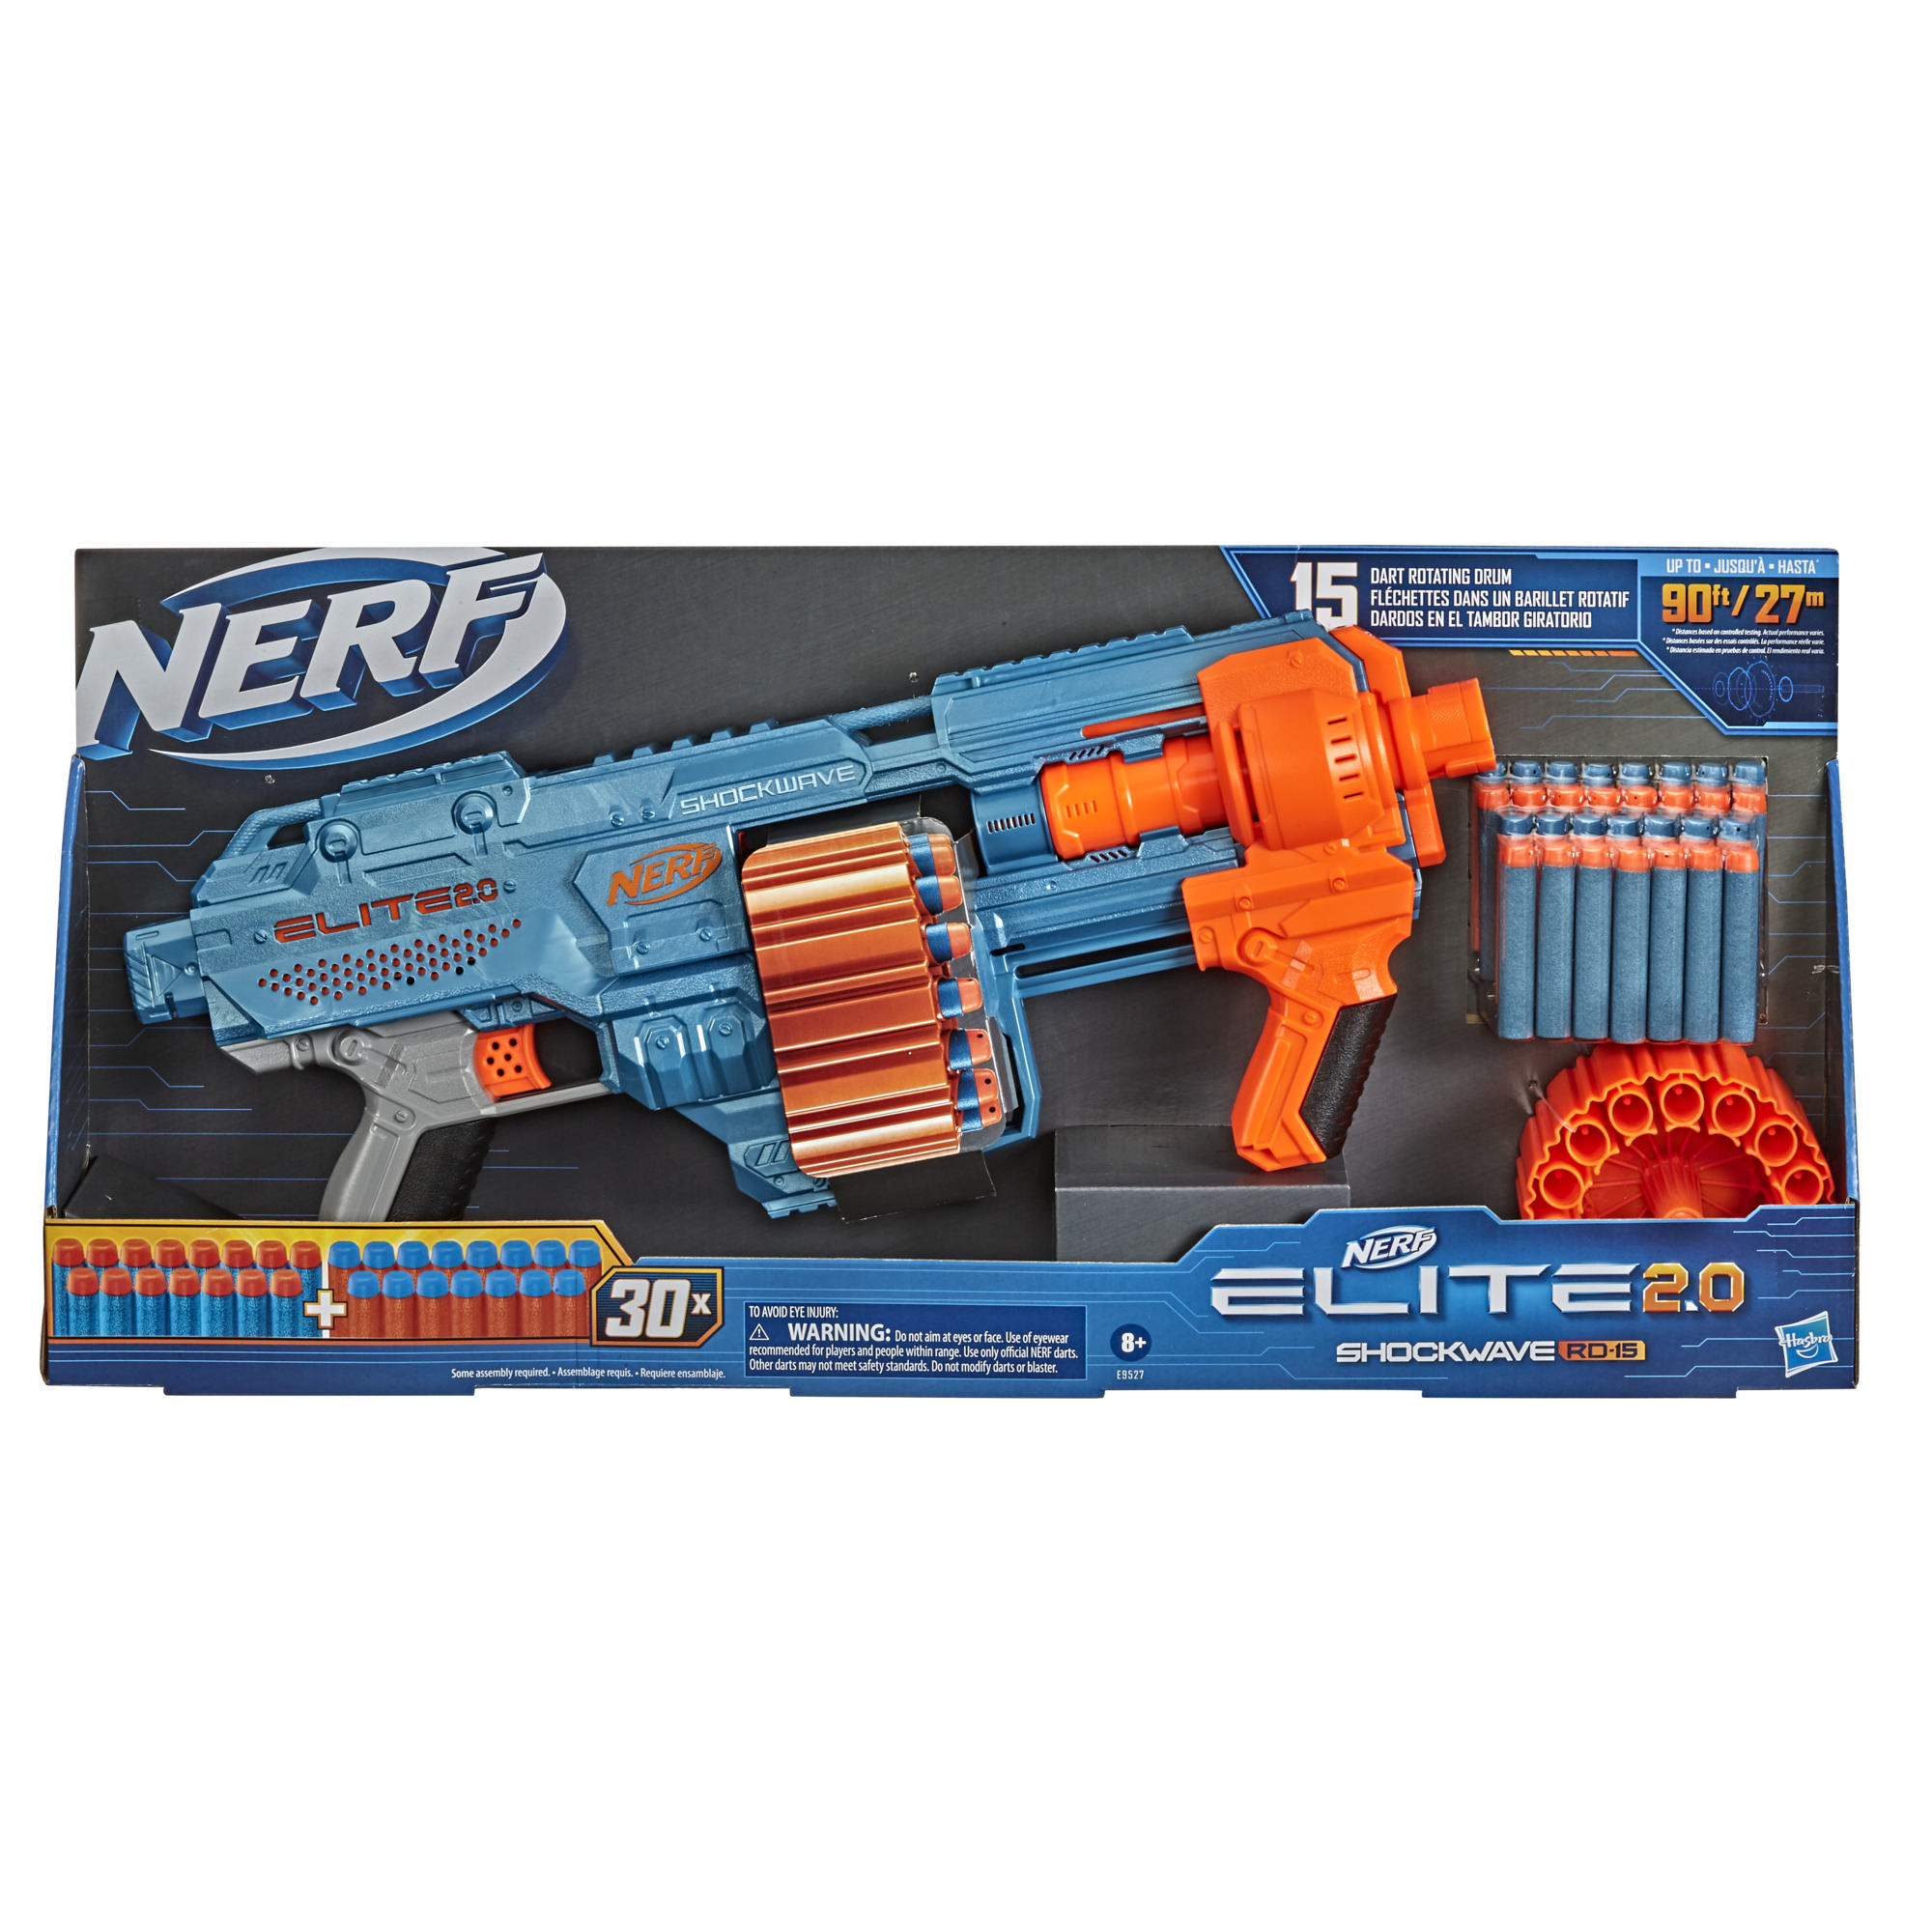 Blaster Nerf Elite 2.0 Shockwave RD-15, 30 de sageti Nerf, magazie rotativa pentru 15 sageti, foc in rafala, posibilitati de personalizare